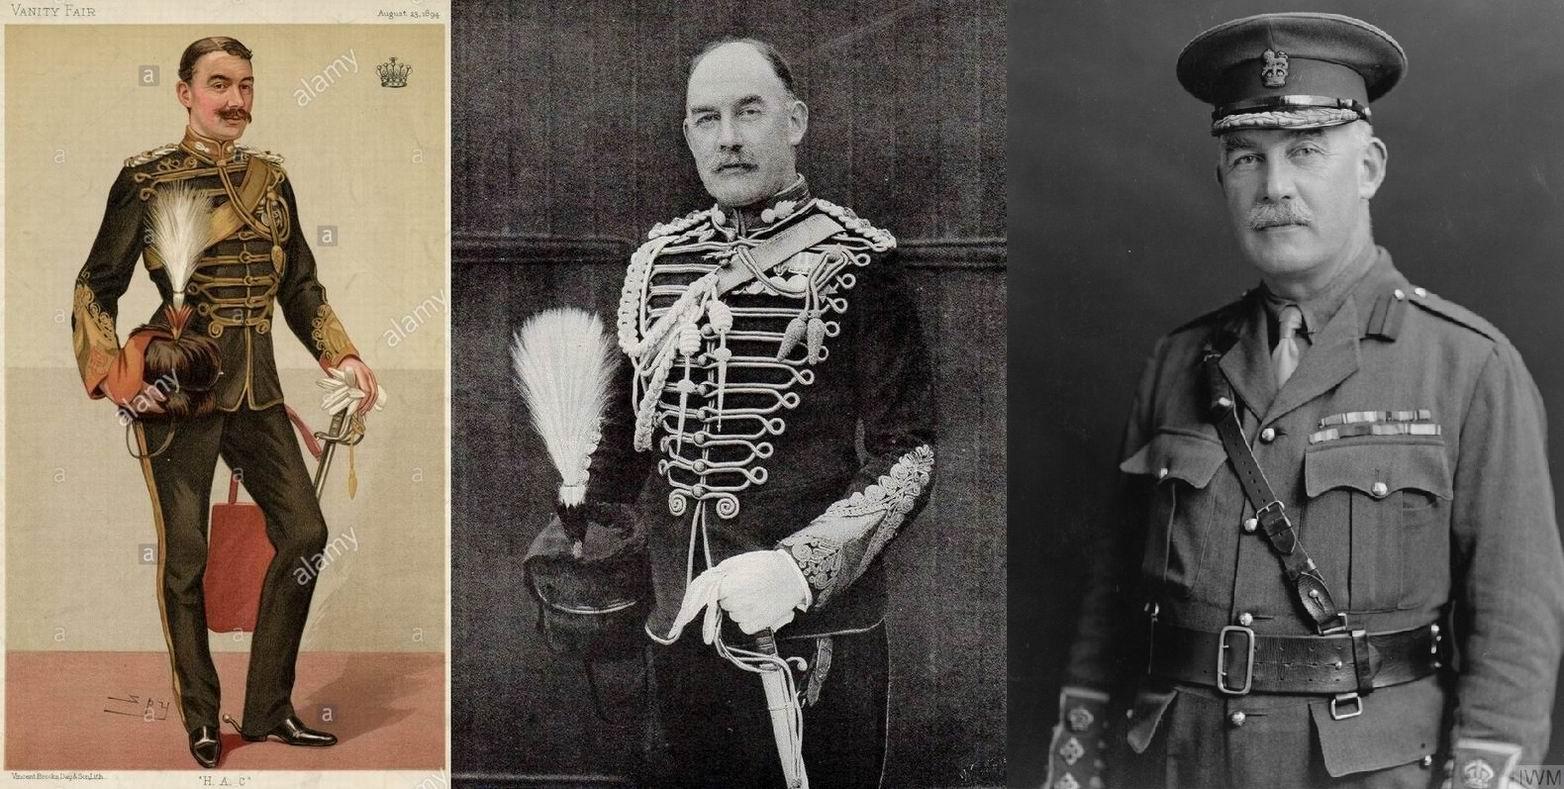 Рудольф Роберт Бэзил Алоизиус Огастин Филдинг, 9й граф Денби, 8й граф Десмонд (1859 – 1939).